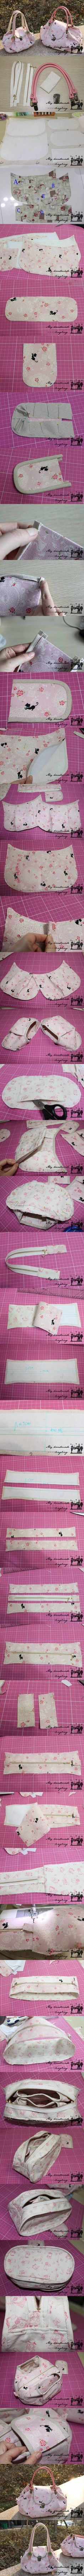 DIY Sew Cute Handbag DIY Sew Cute Handbag by diyforever